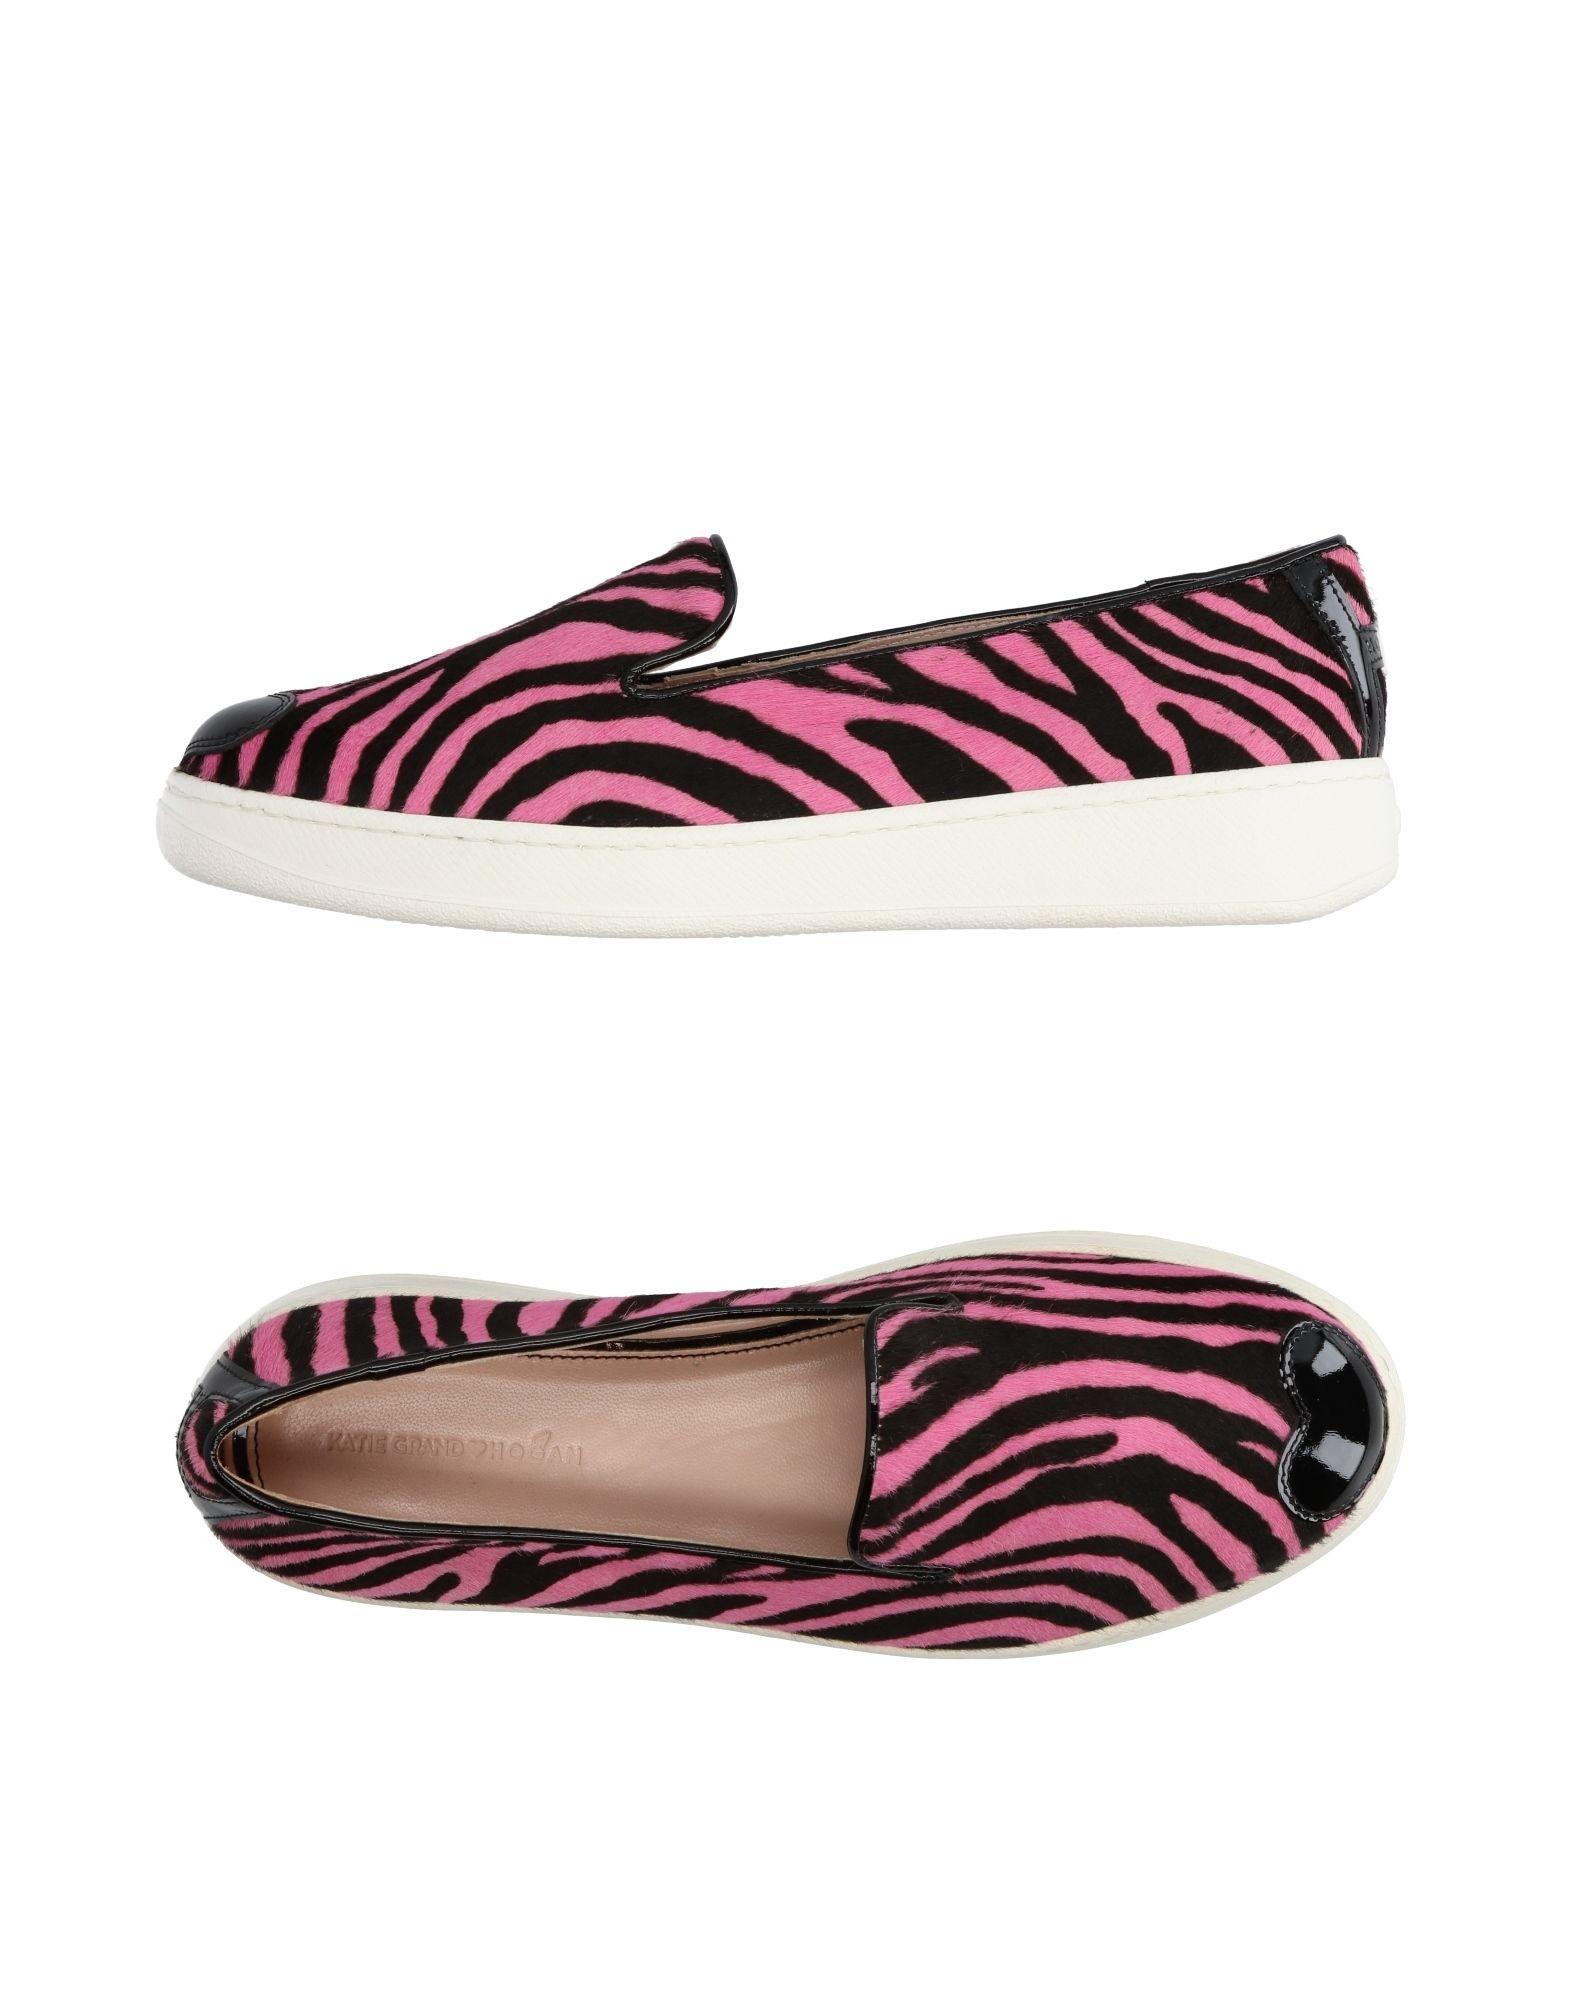 Sneakers Katie Grand Loves Hogan Donna - Acquista online su